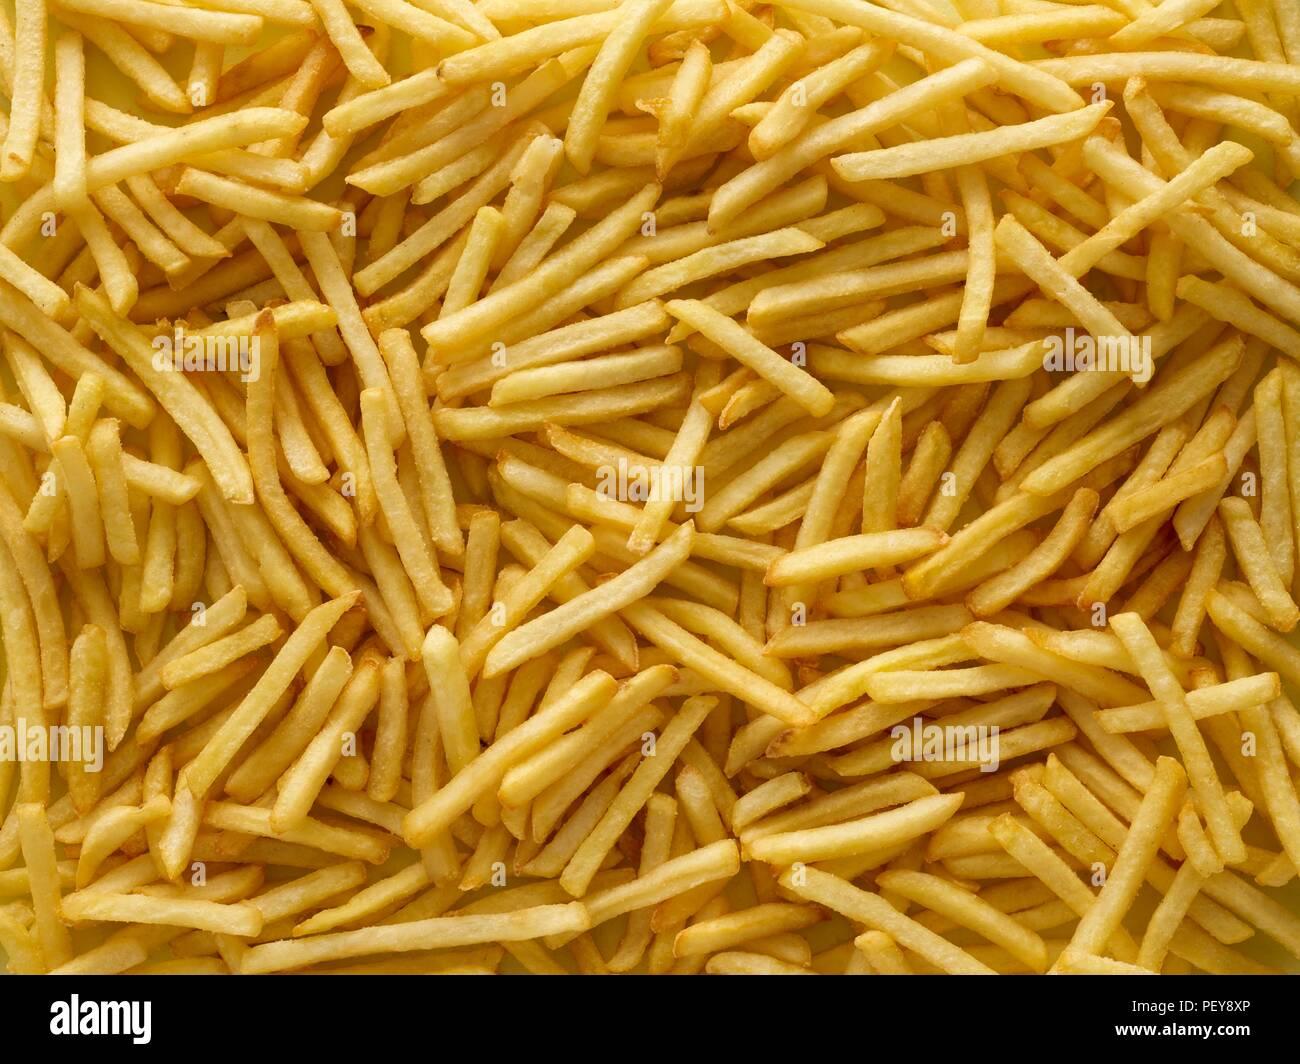 Las papas fritas, full frame. Imagen De Stock